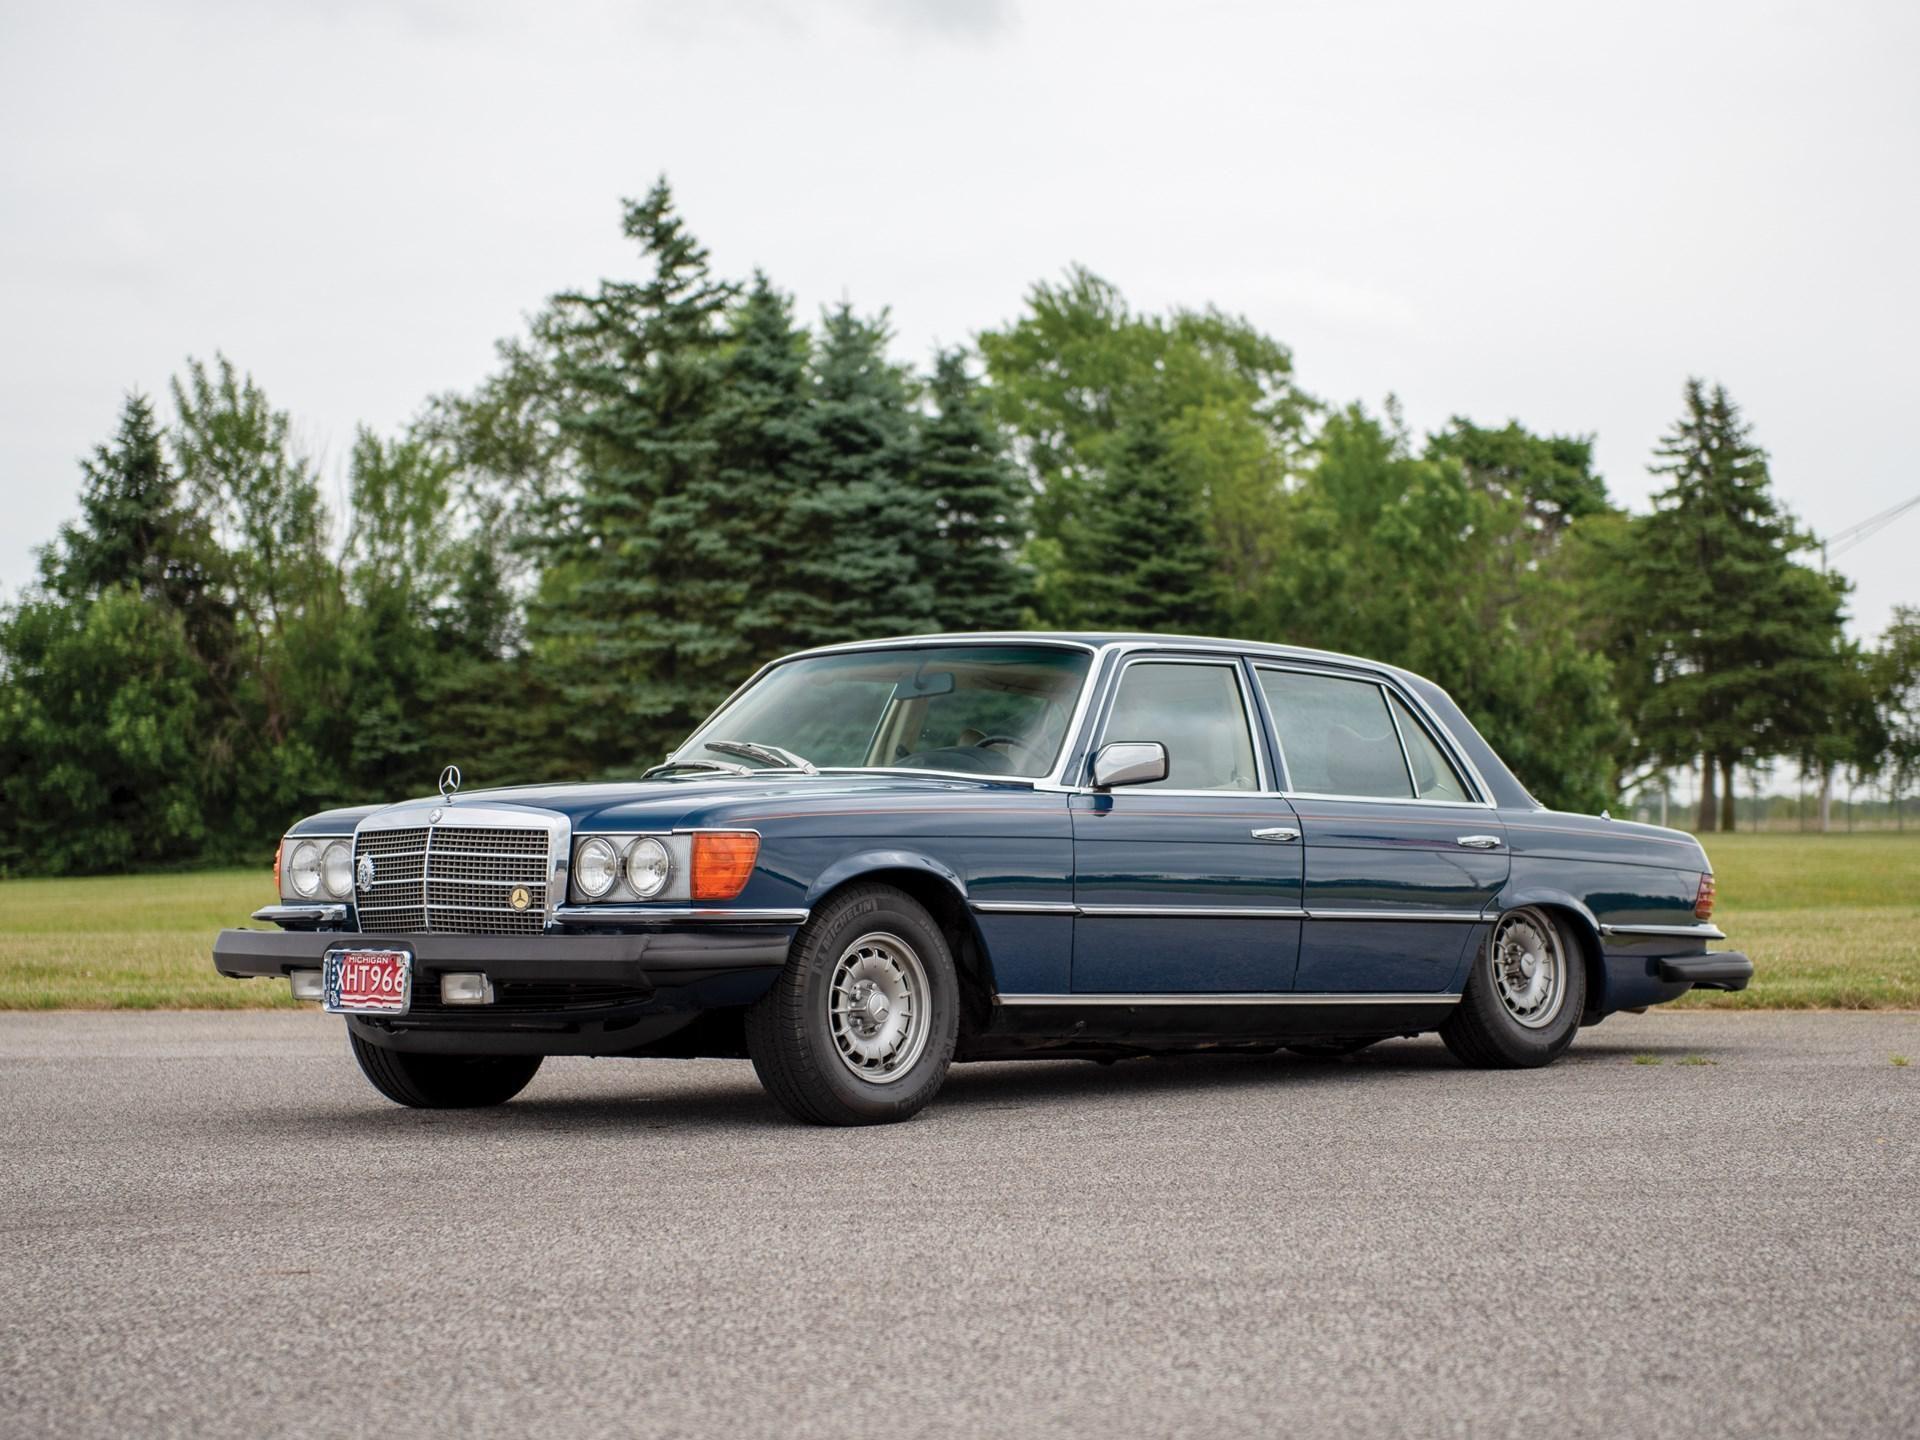 1977 Mercedes-Benz 450 SEL 6.9 Sedan